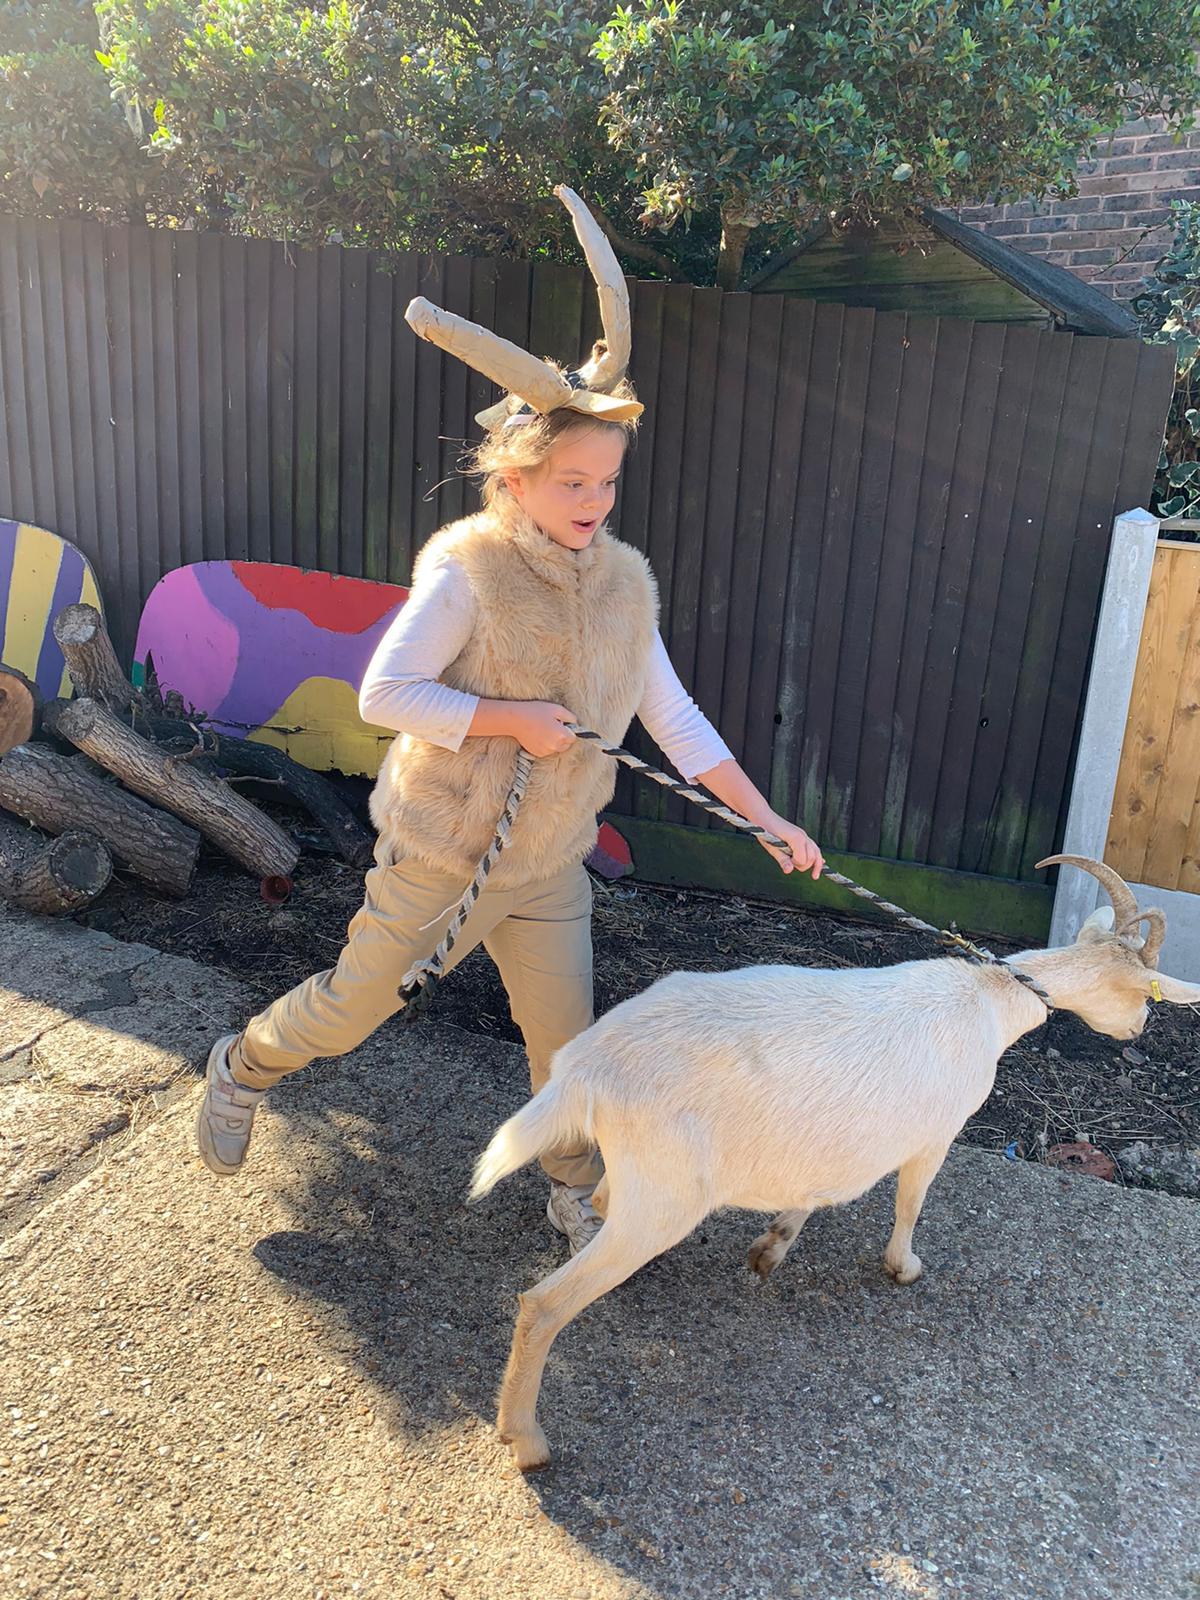 Animal most like its handler: Kentish Town City Farm